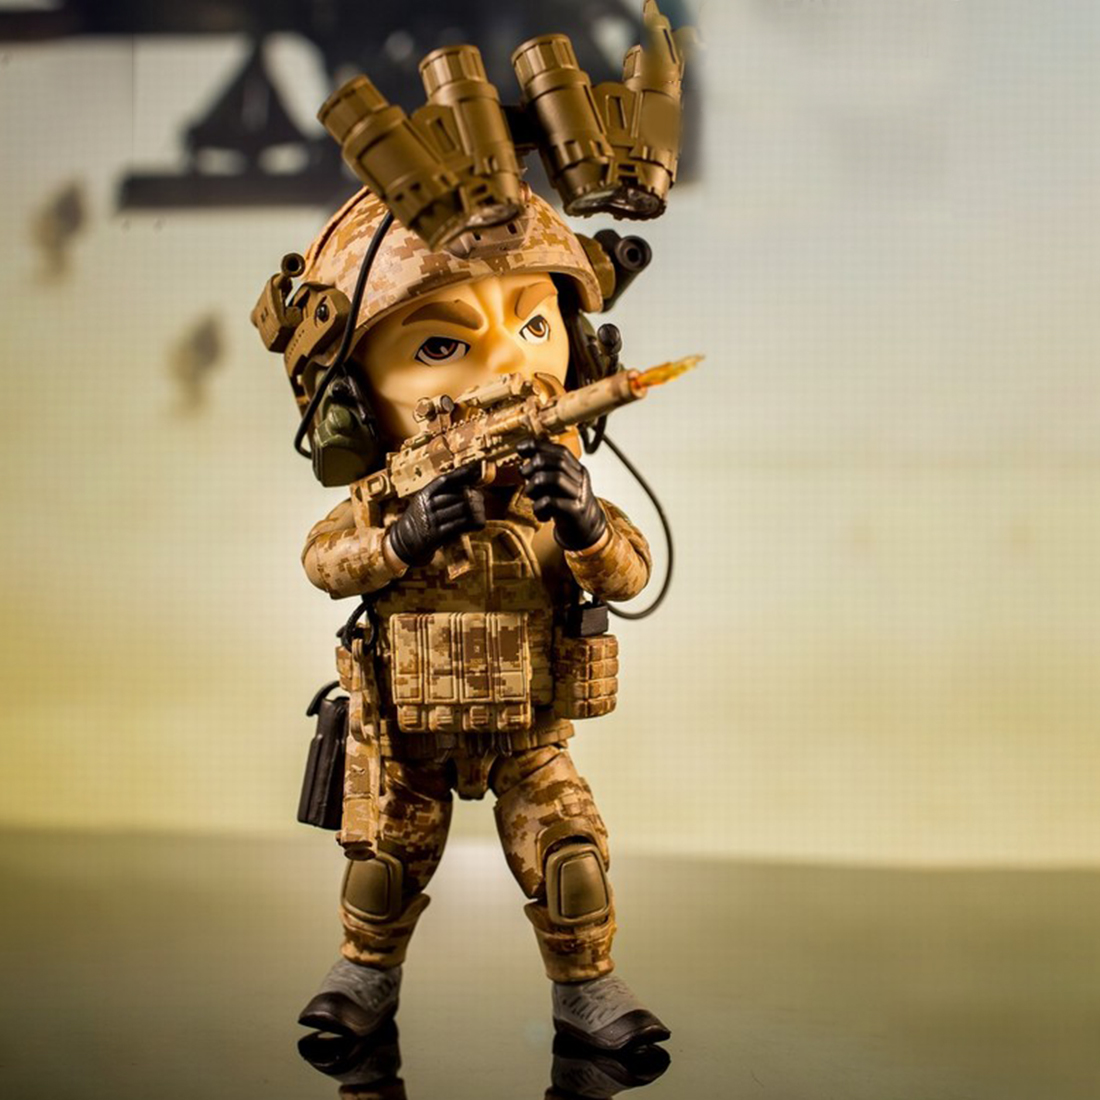 "FigureBase TM003 5/"" Trickyman Seal Team 6 MINI Action Figure Model Toy"